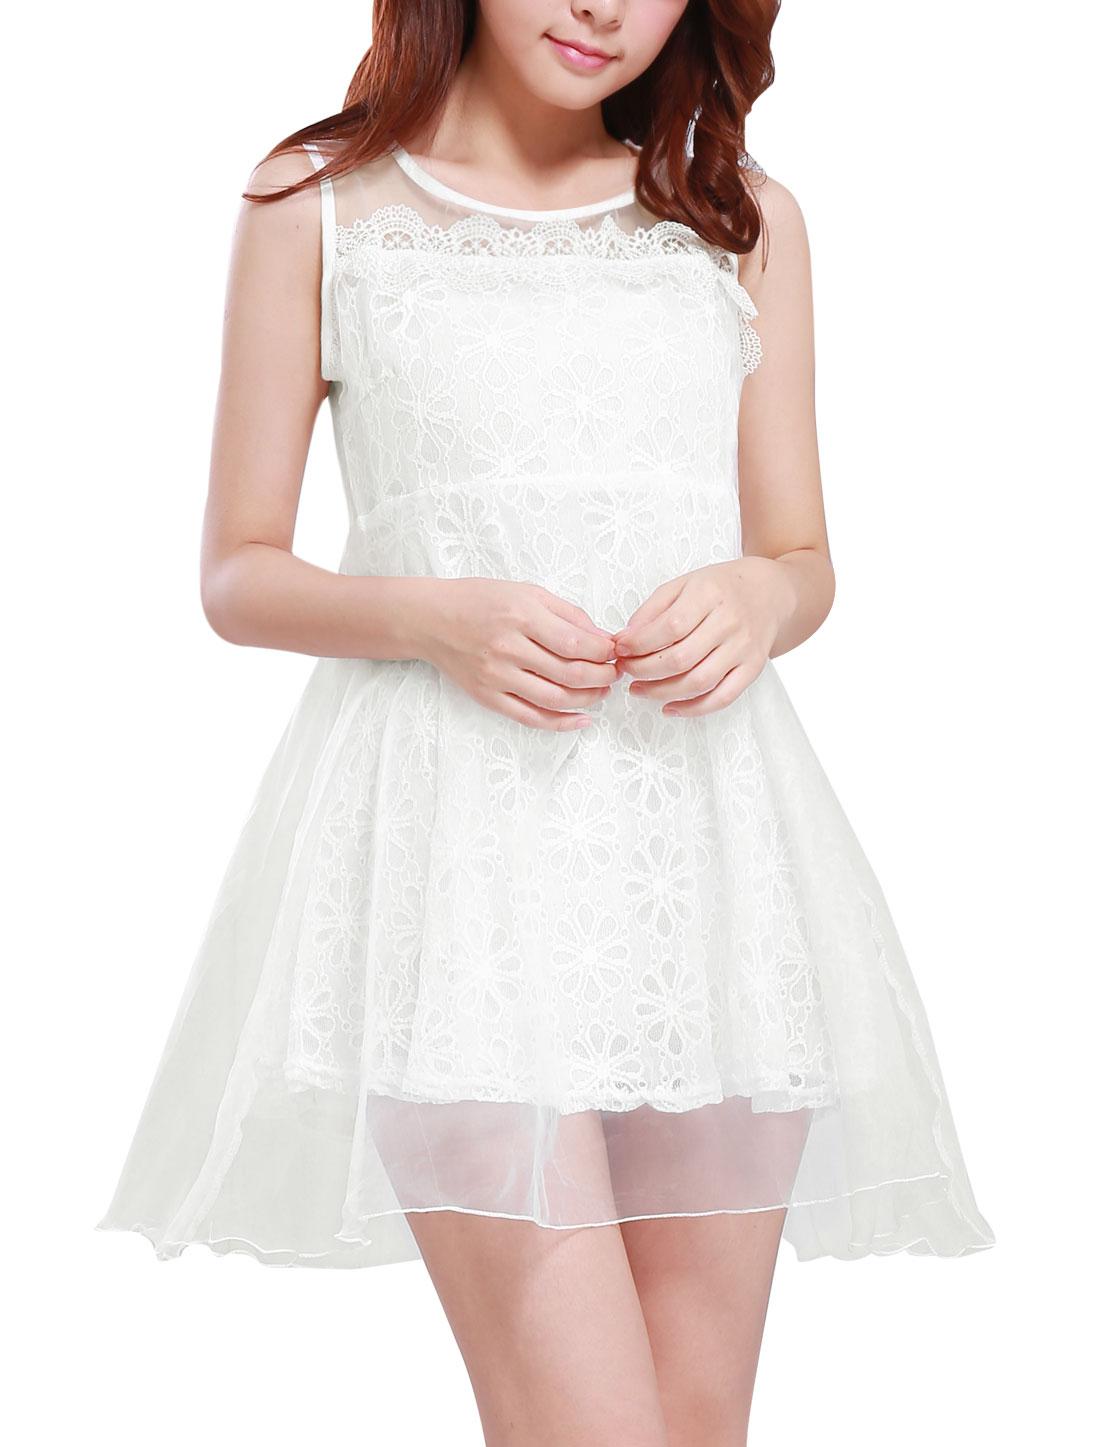 Lady Round Neck Sleeveless Organza Overlay Lace Dress White S